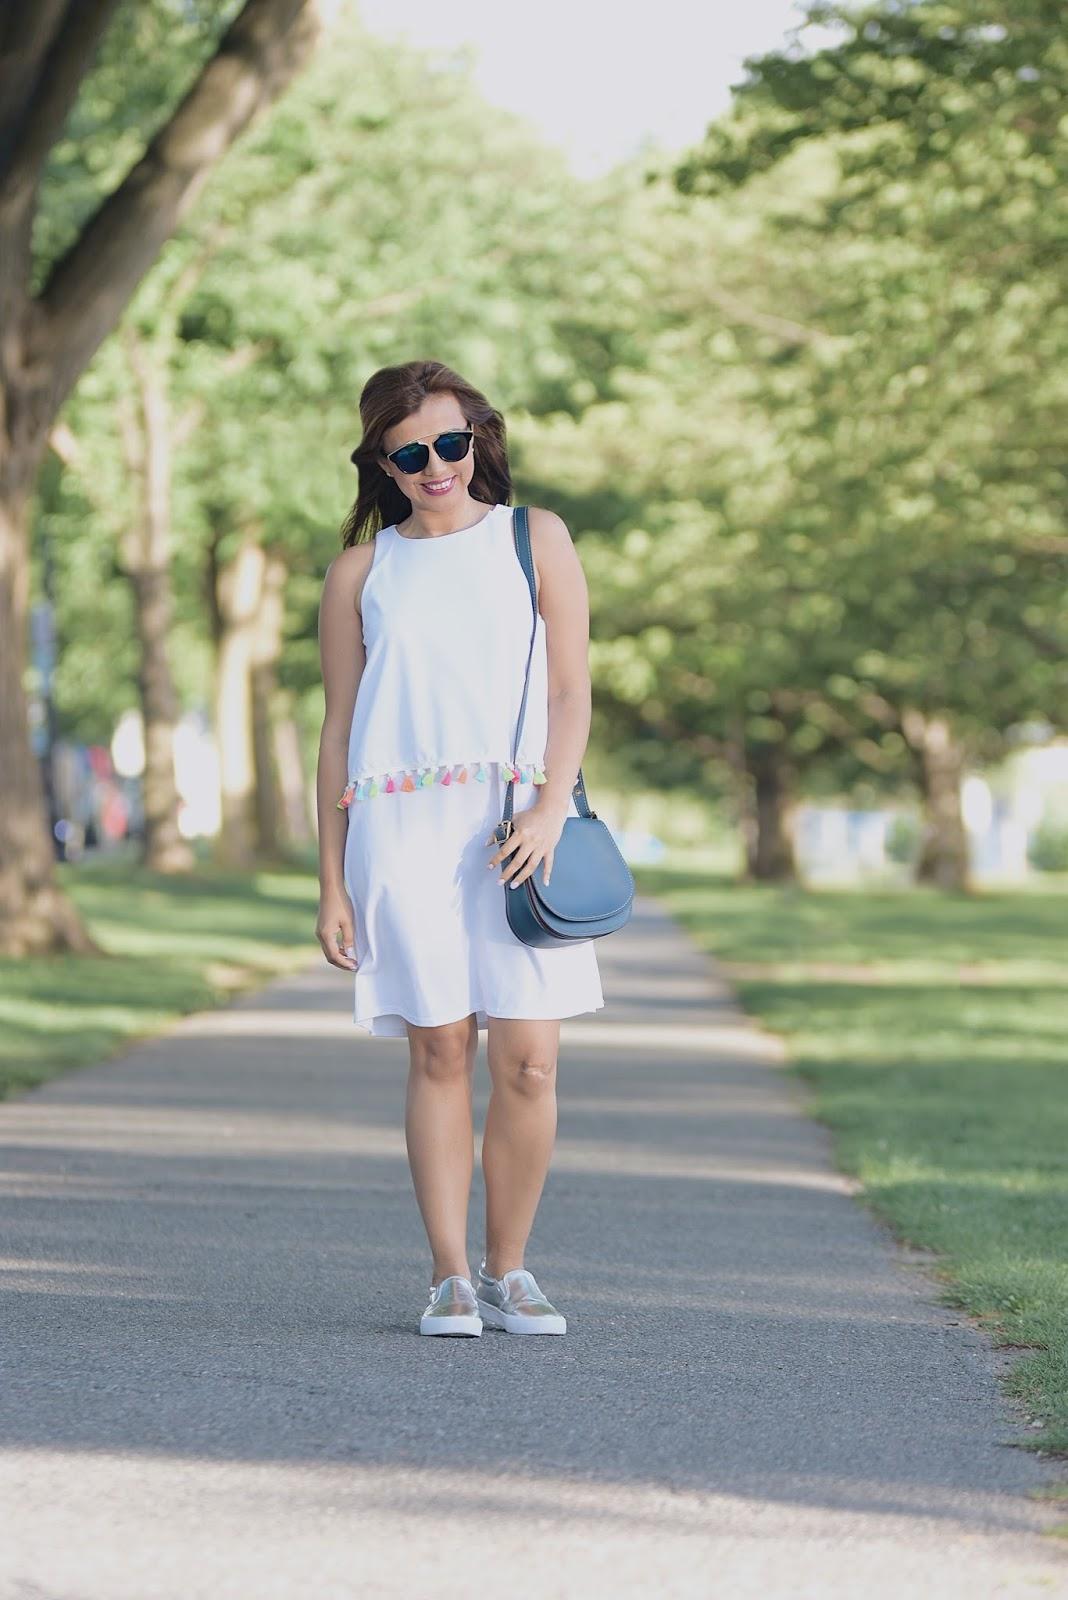 Pompones-MariEstilo-Romwe-Fashion blogger-streetstyle-spring-fashionideas-mariestilotravels-dcblogger-modayestilo